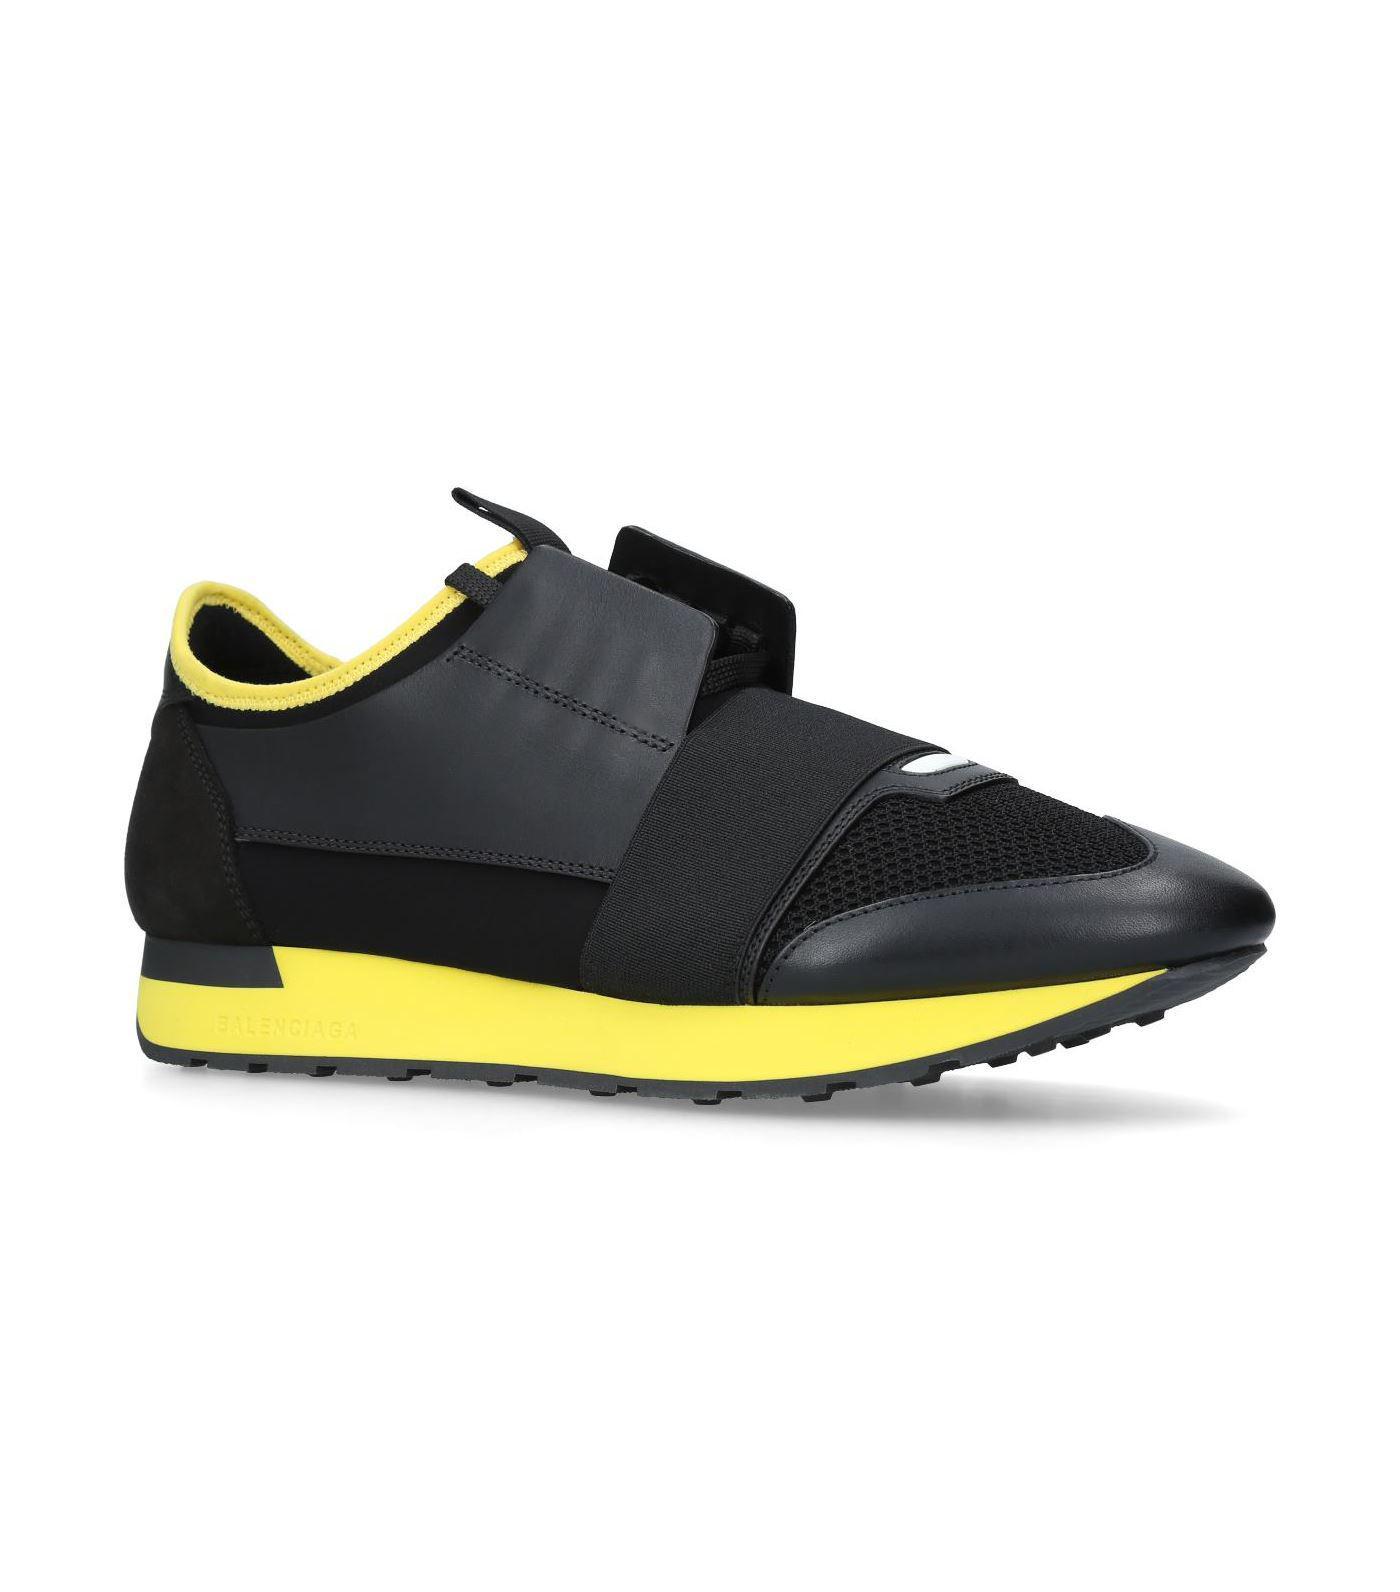 ca885b555741 Lyst - Balenciaga Race Runner Sneakers in Blue for Men